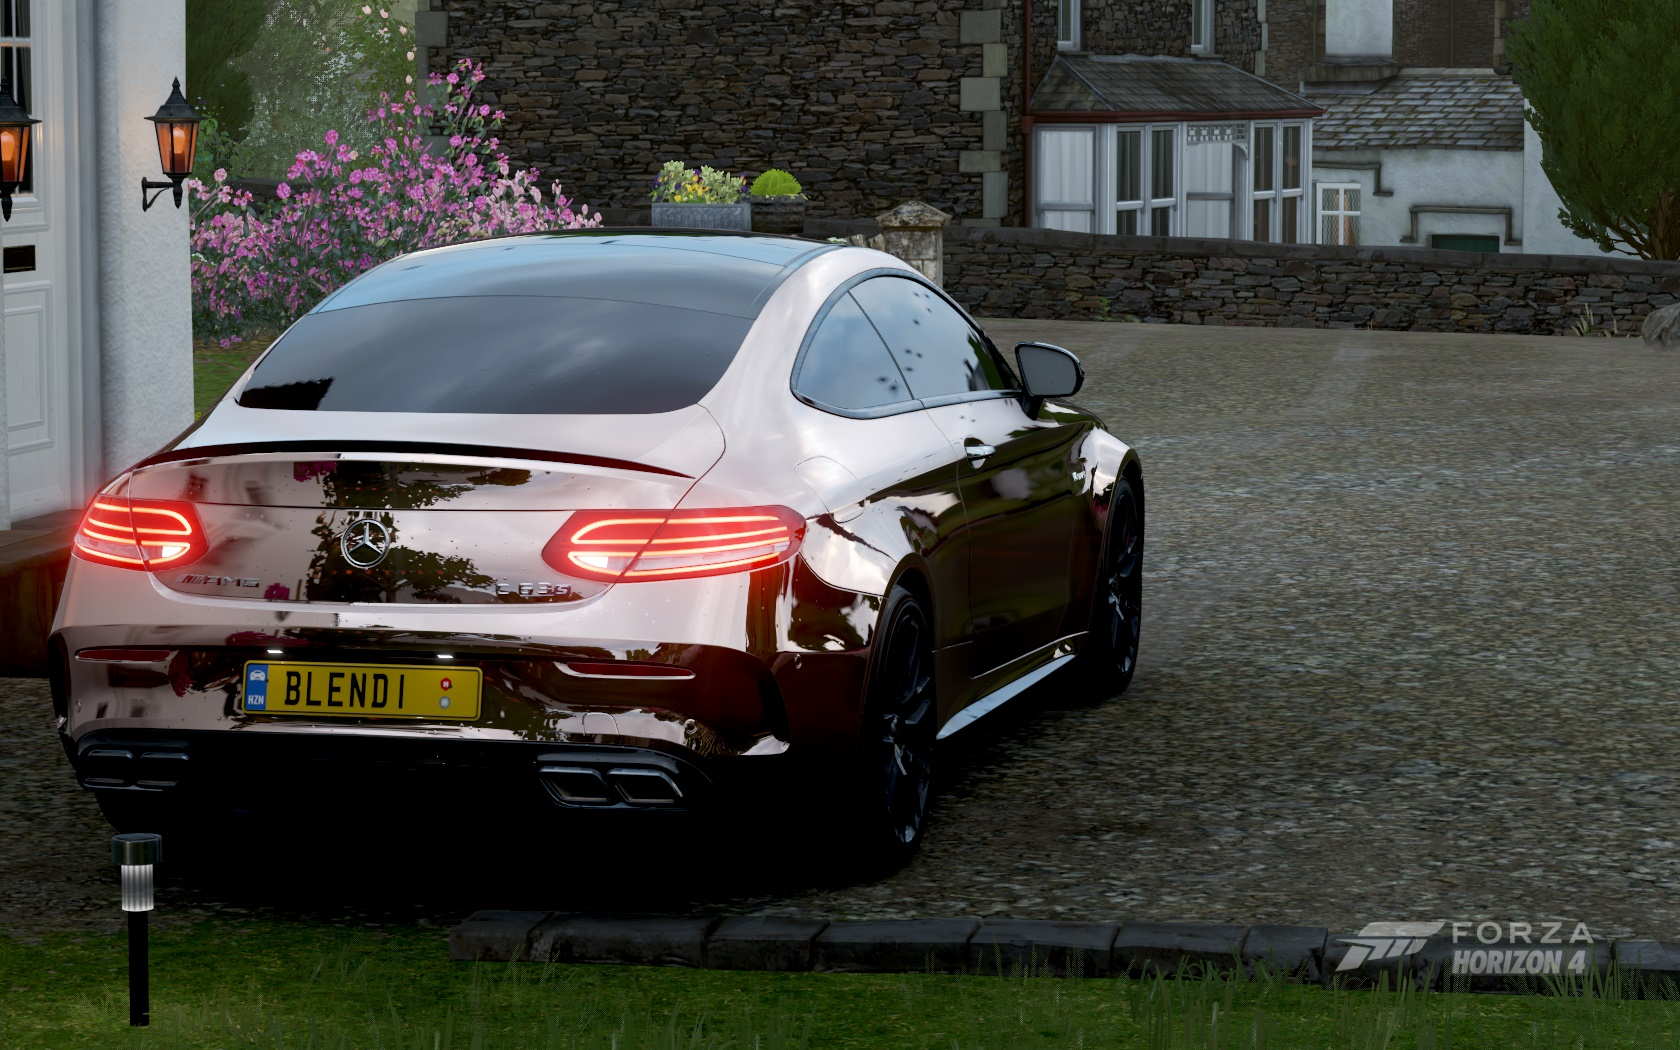 General 1680x1050 car racing Home (movie) Mercedes AMG GTs